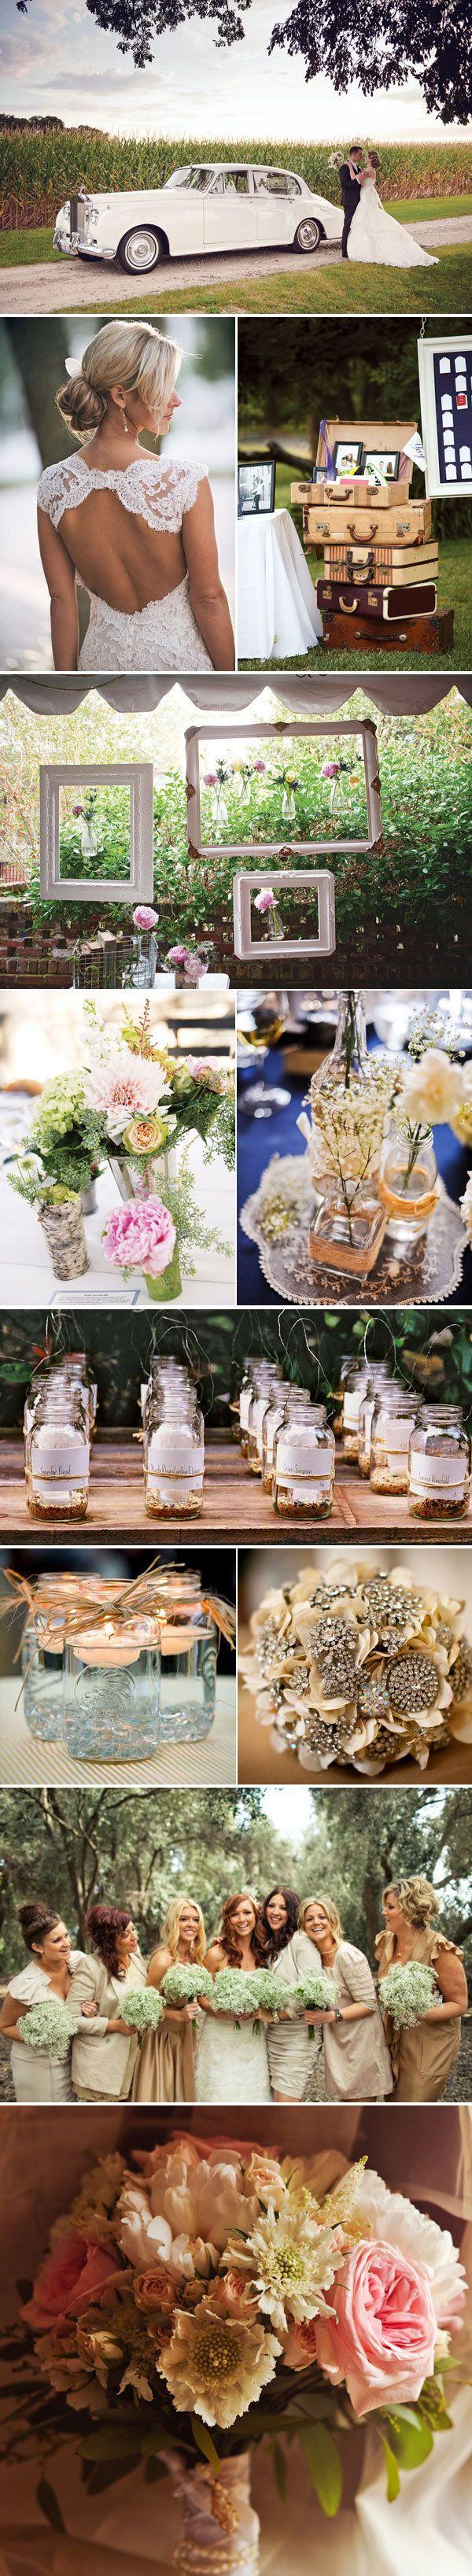 best Hollyu s wedding pics images on Pinterest Wedding